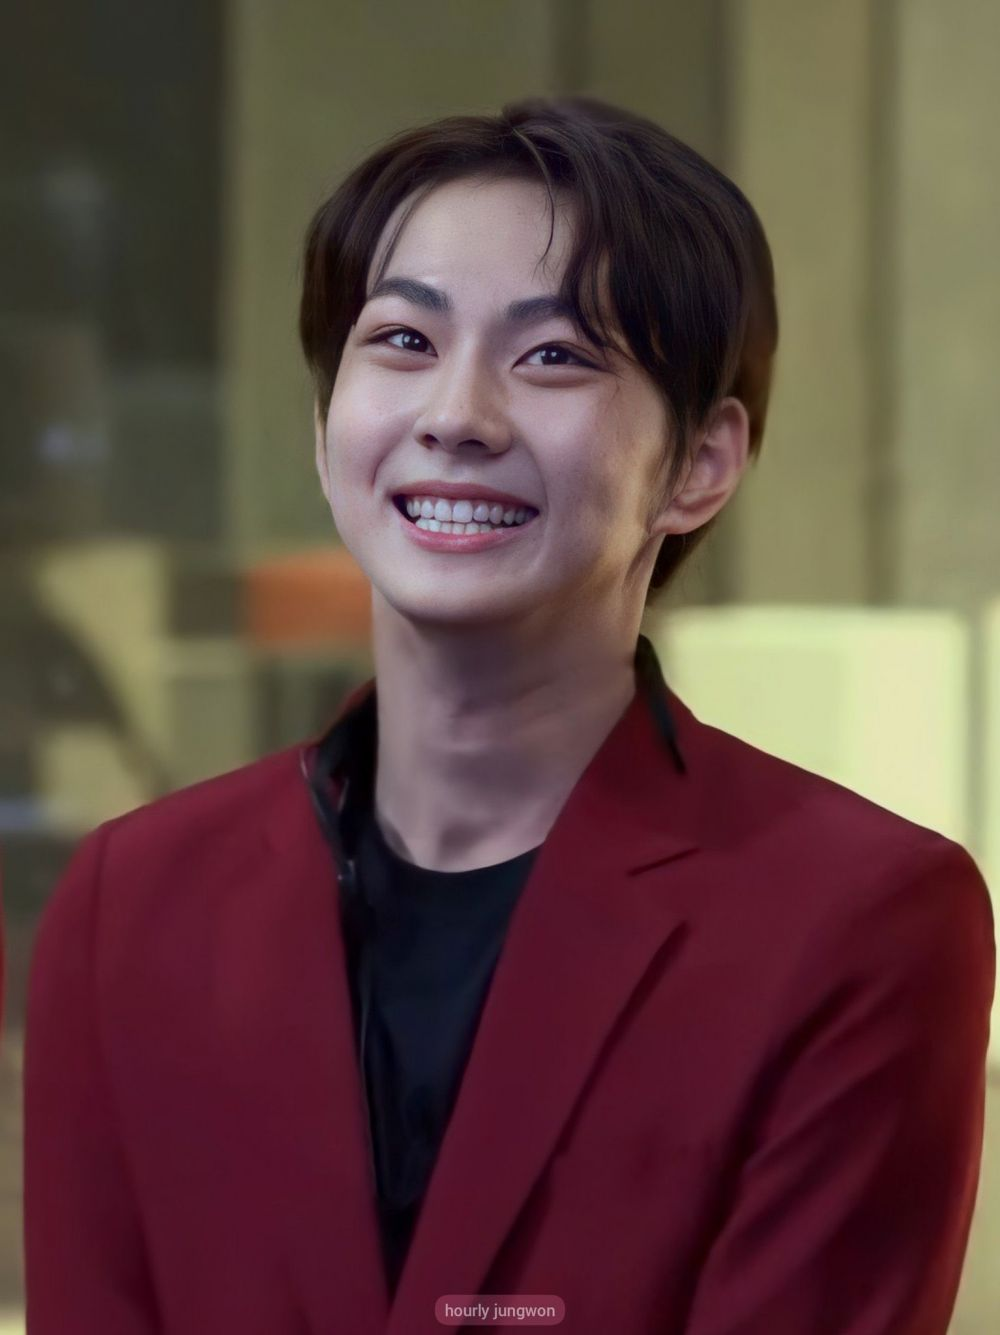 9 Potret Yang Jungwon ENHYPEN, Si Pemilik Lesung Pipit Menawan!